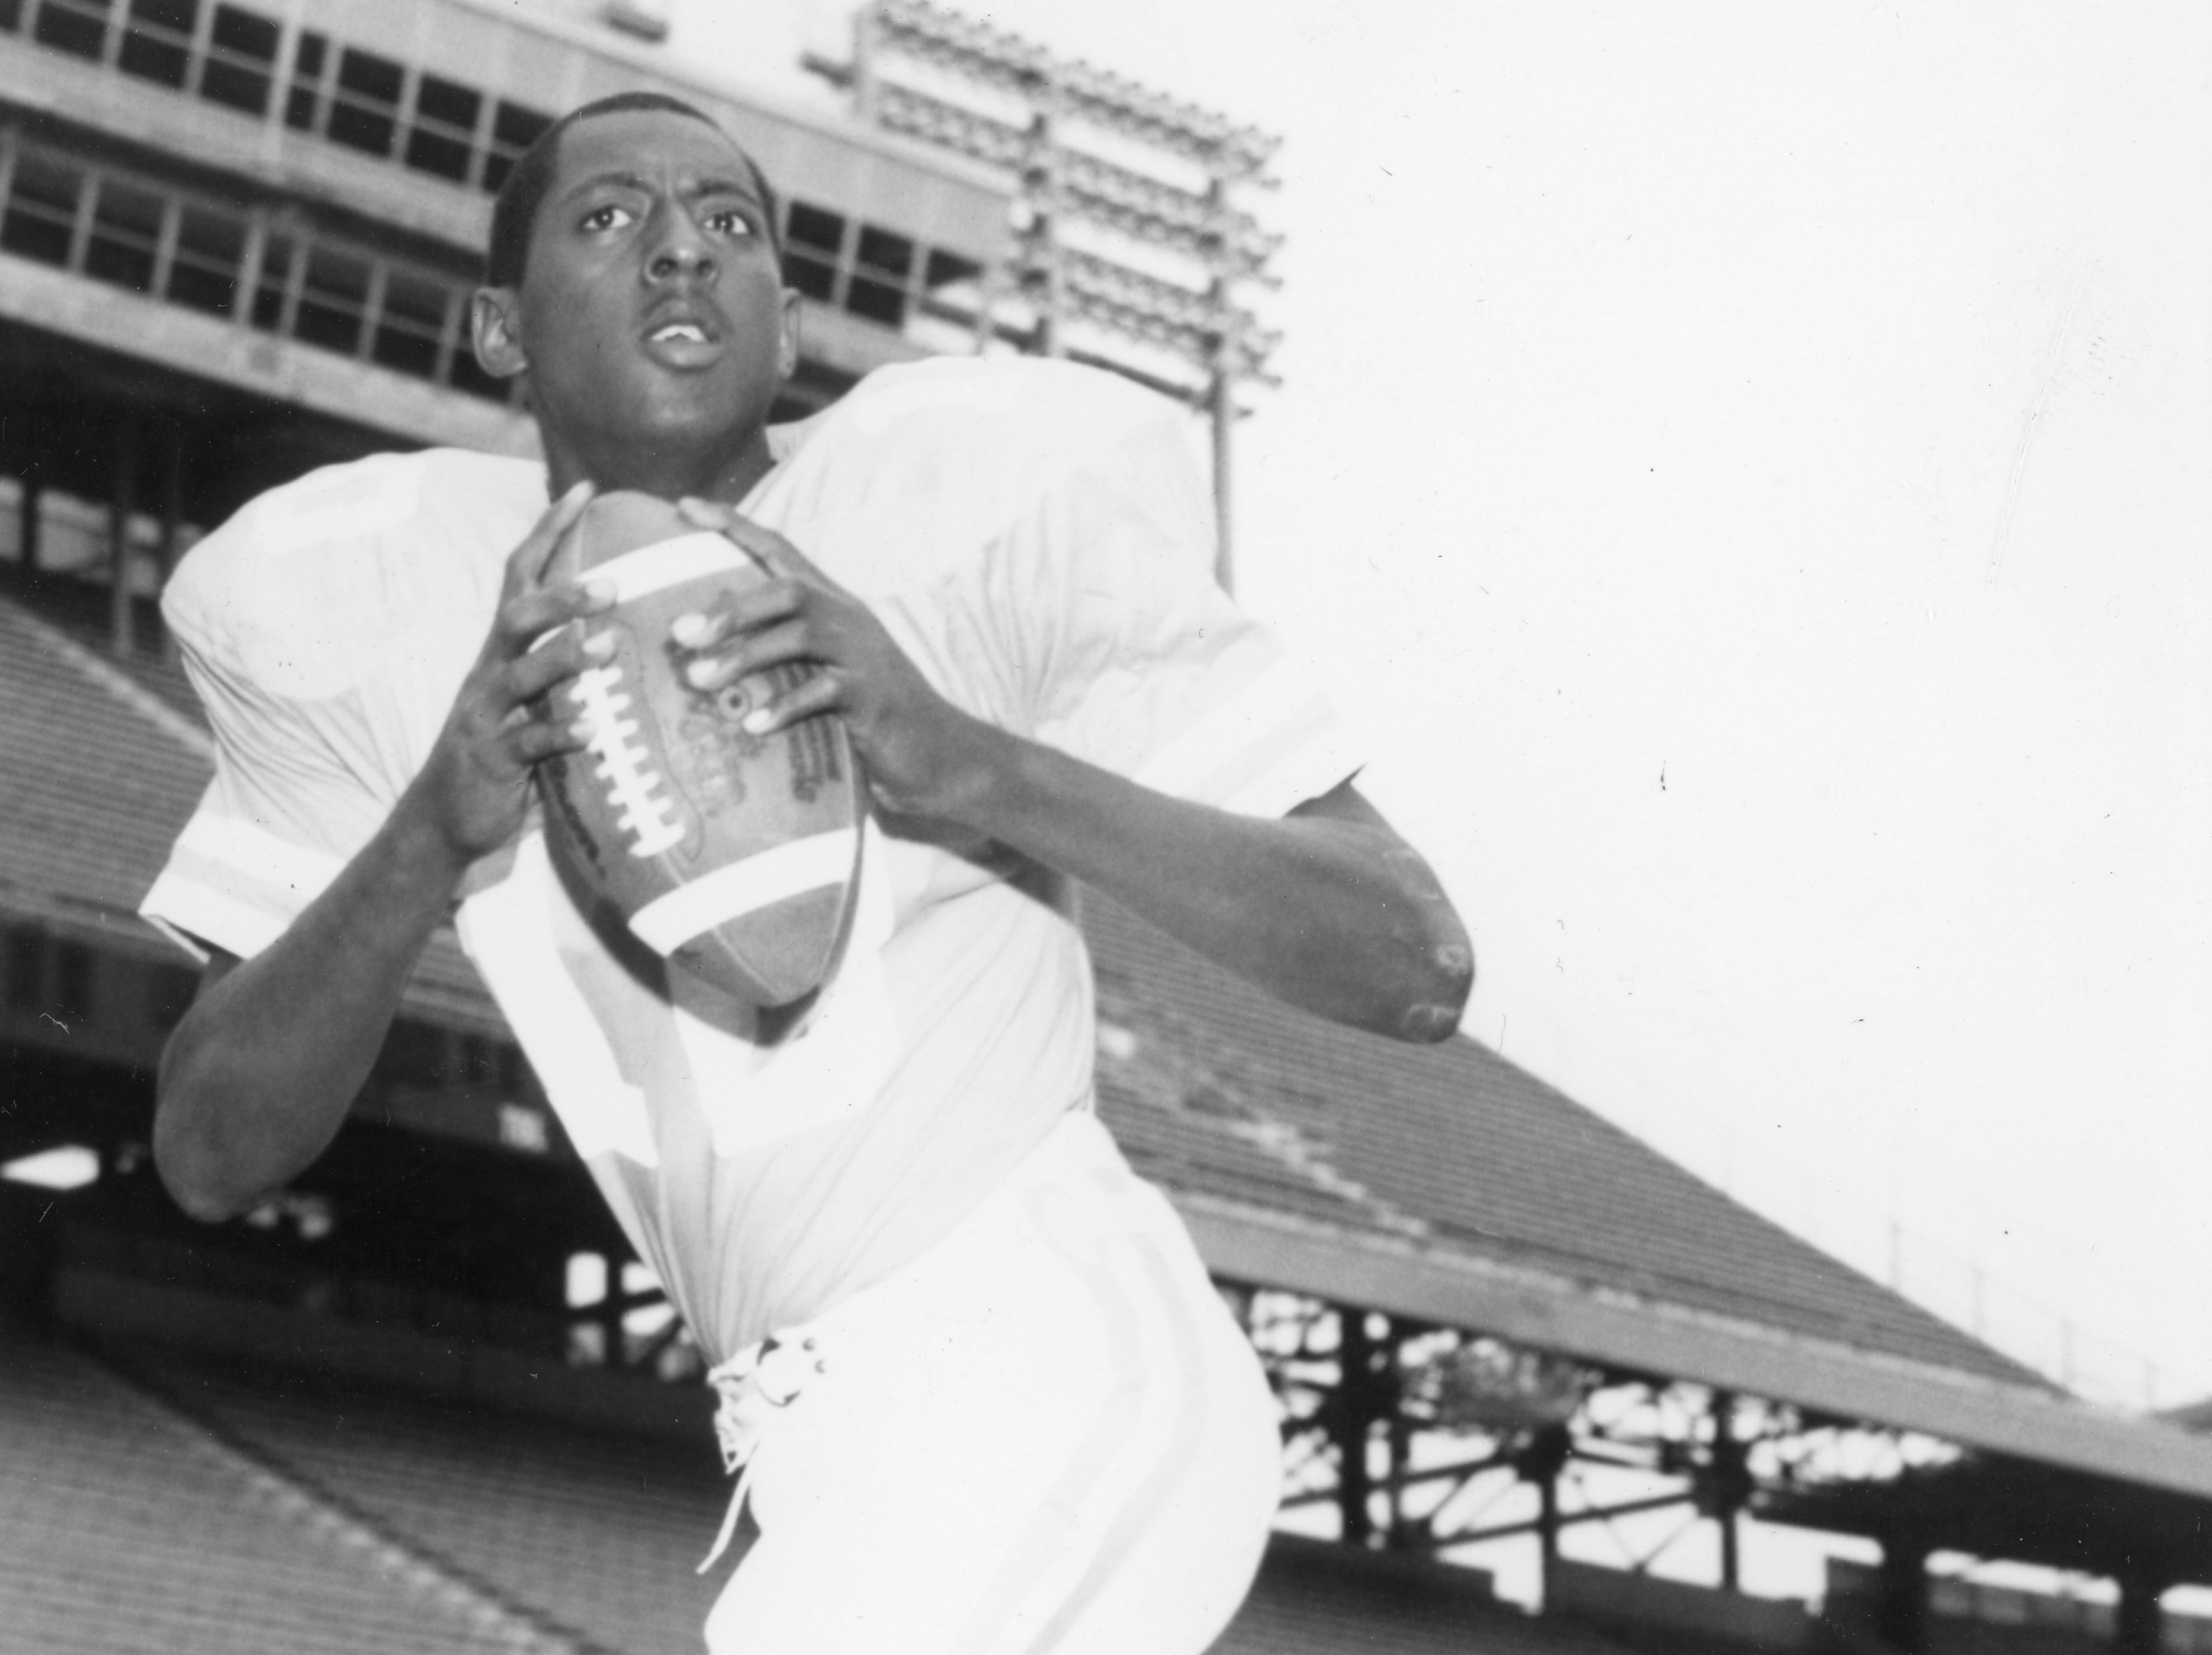 Tennessee Vols quarterback Tony Robinson on January 28, 1987.